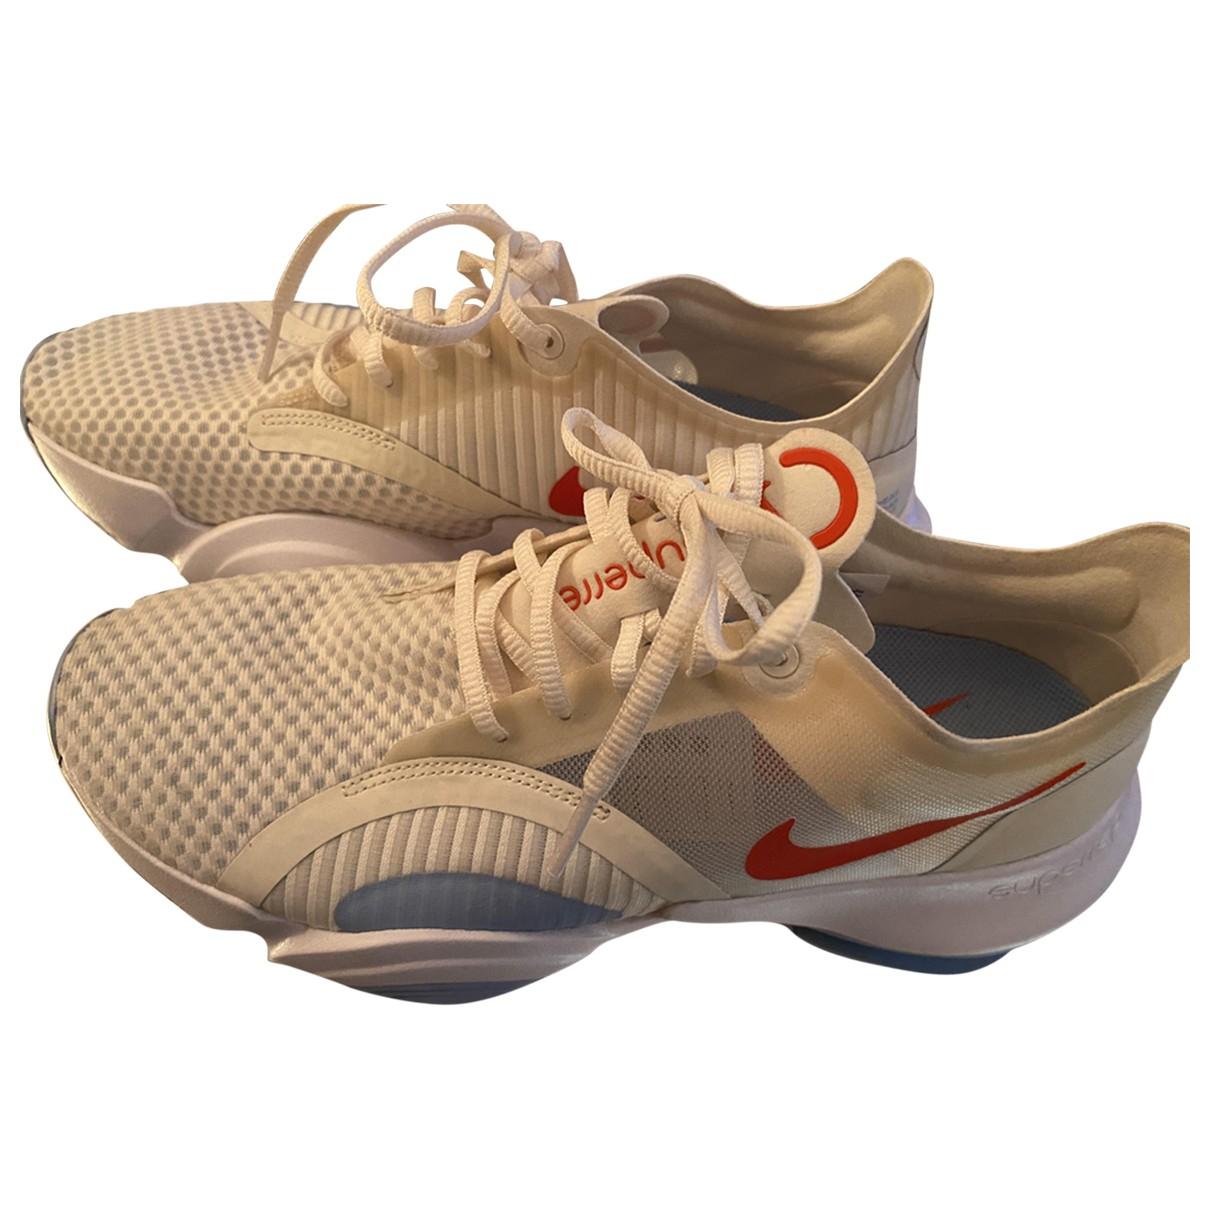 Nike \N Sneakers in  Ecru Leinen